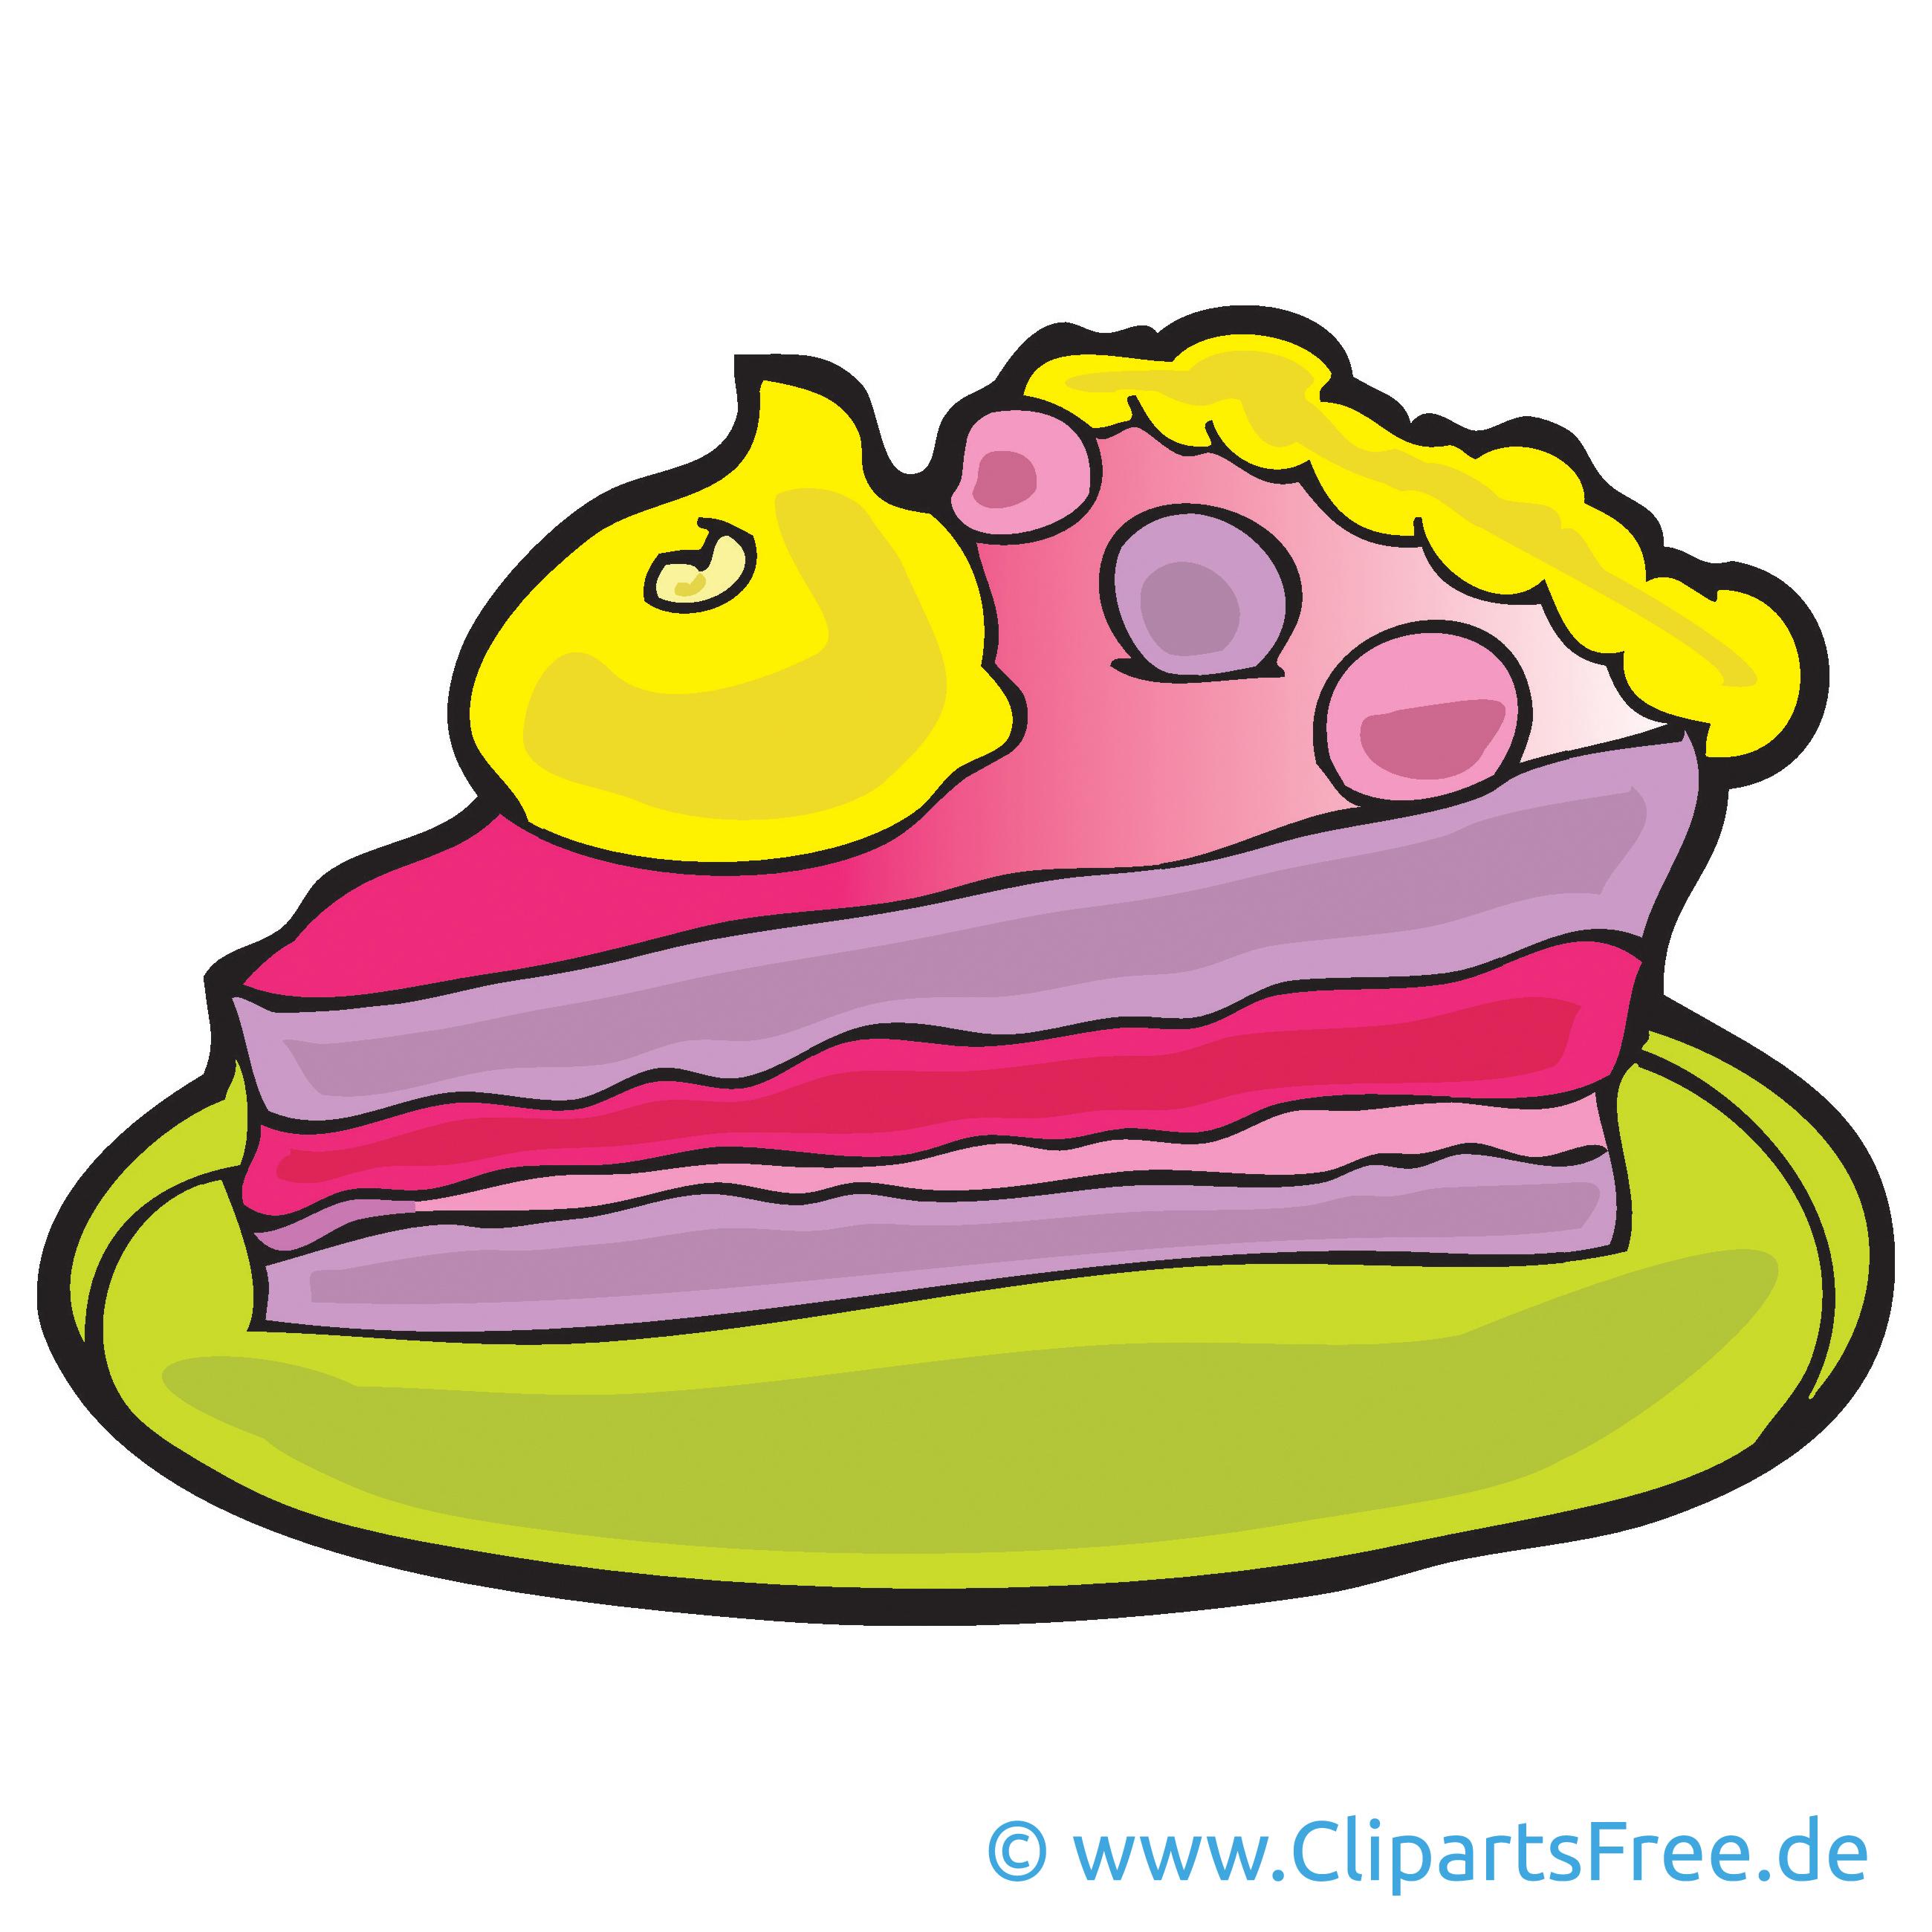 Torte Bild, Cartoon, Clipart, Grafik, Illustration